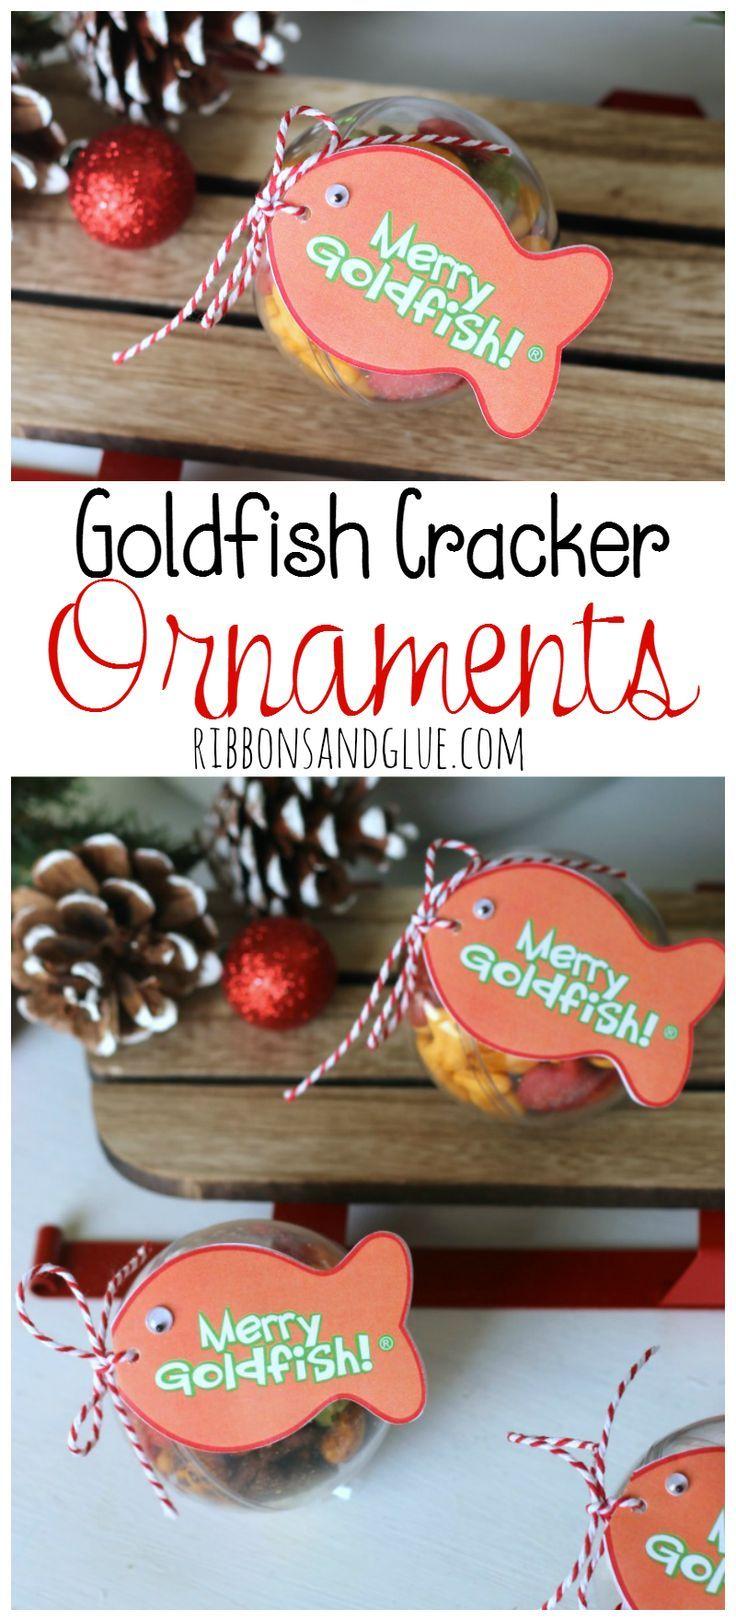 Goldfish Cracker Christmas Ornaments | Goldfish crackers ...